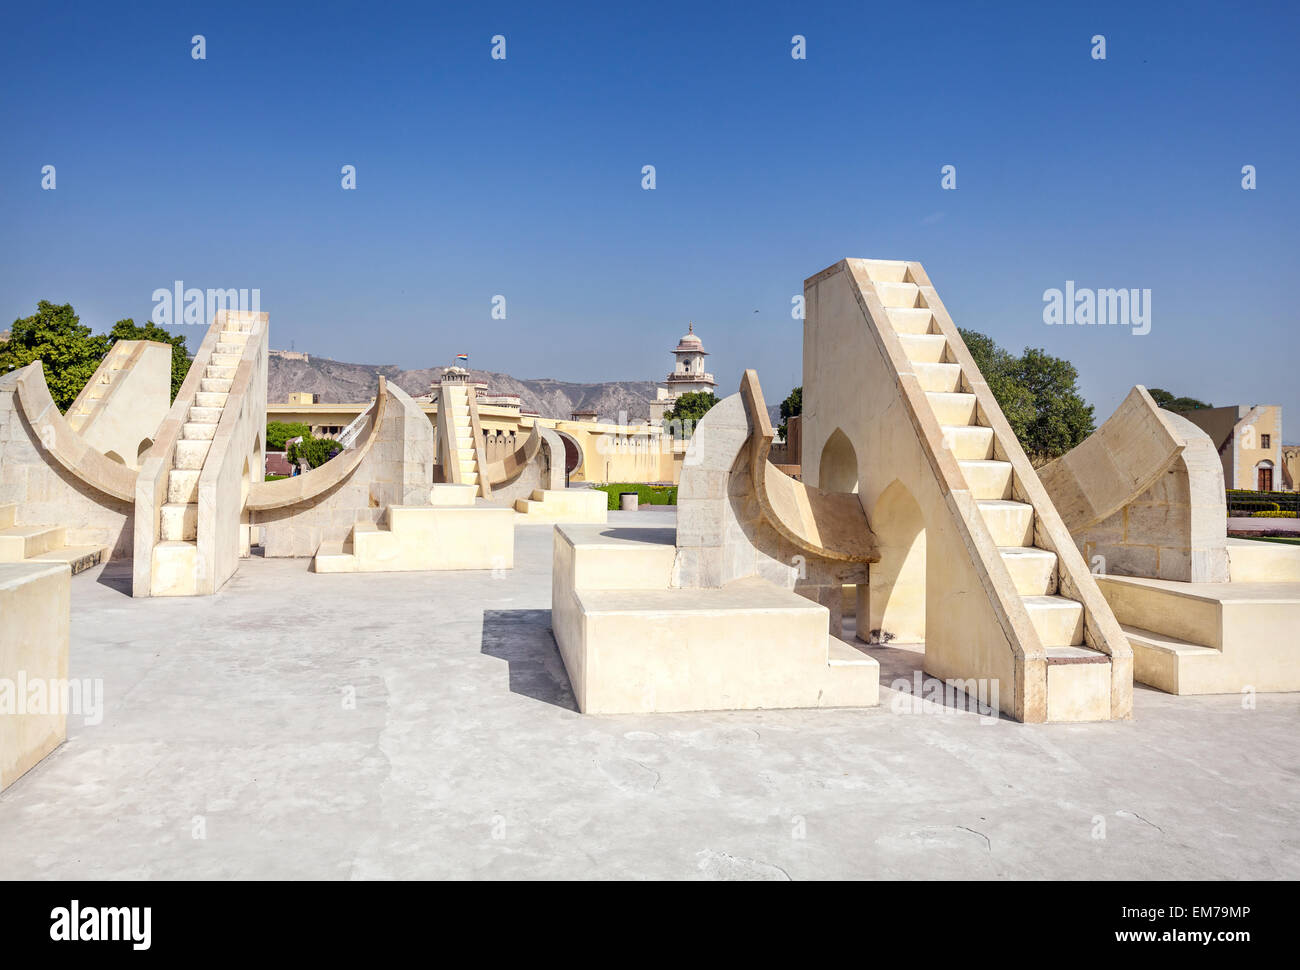 L'observatoire Jantar Mantar complexe au ciel bleu à Jaipur, Rajasthan, Inde Photo Stock